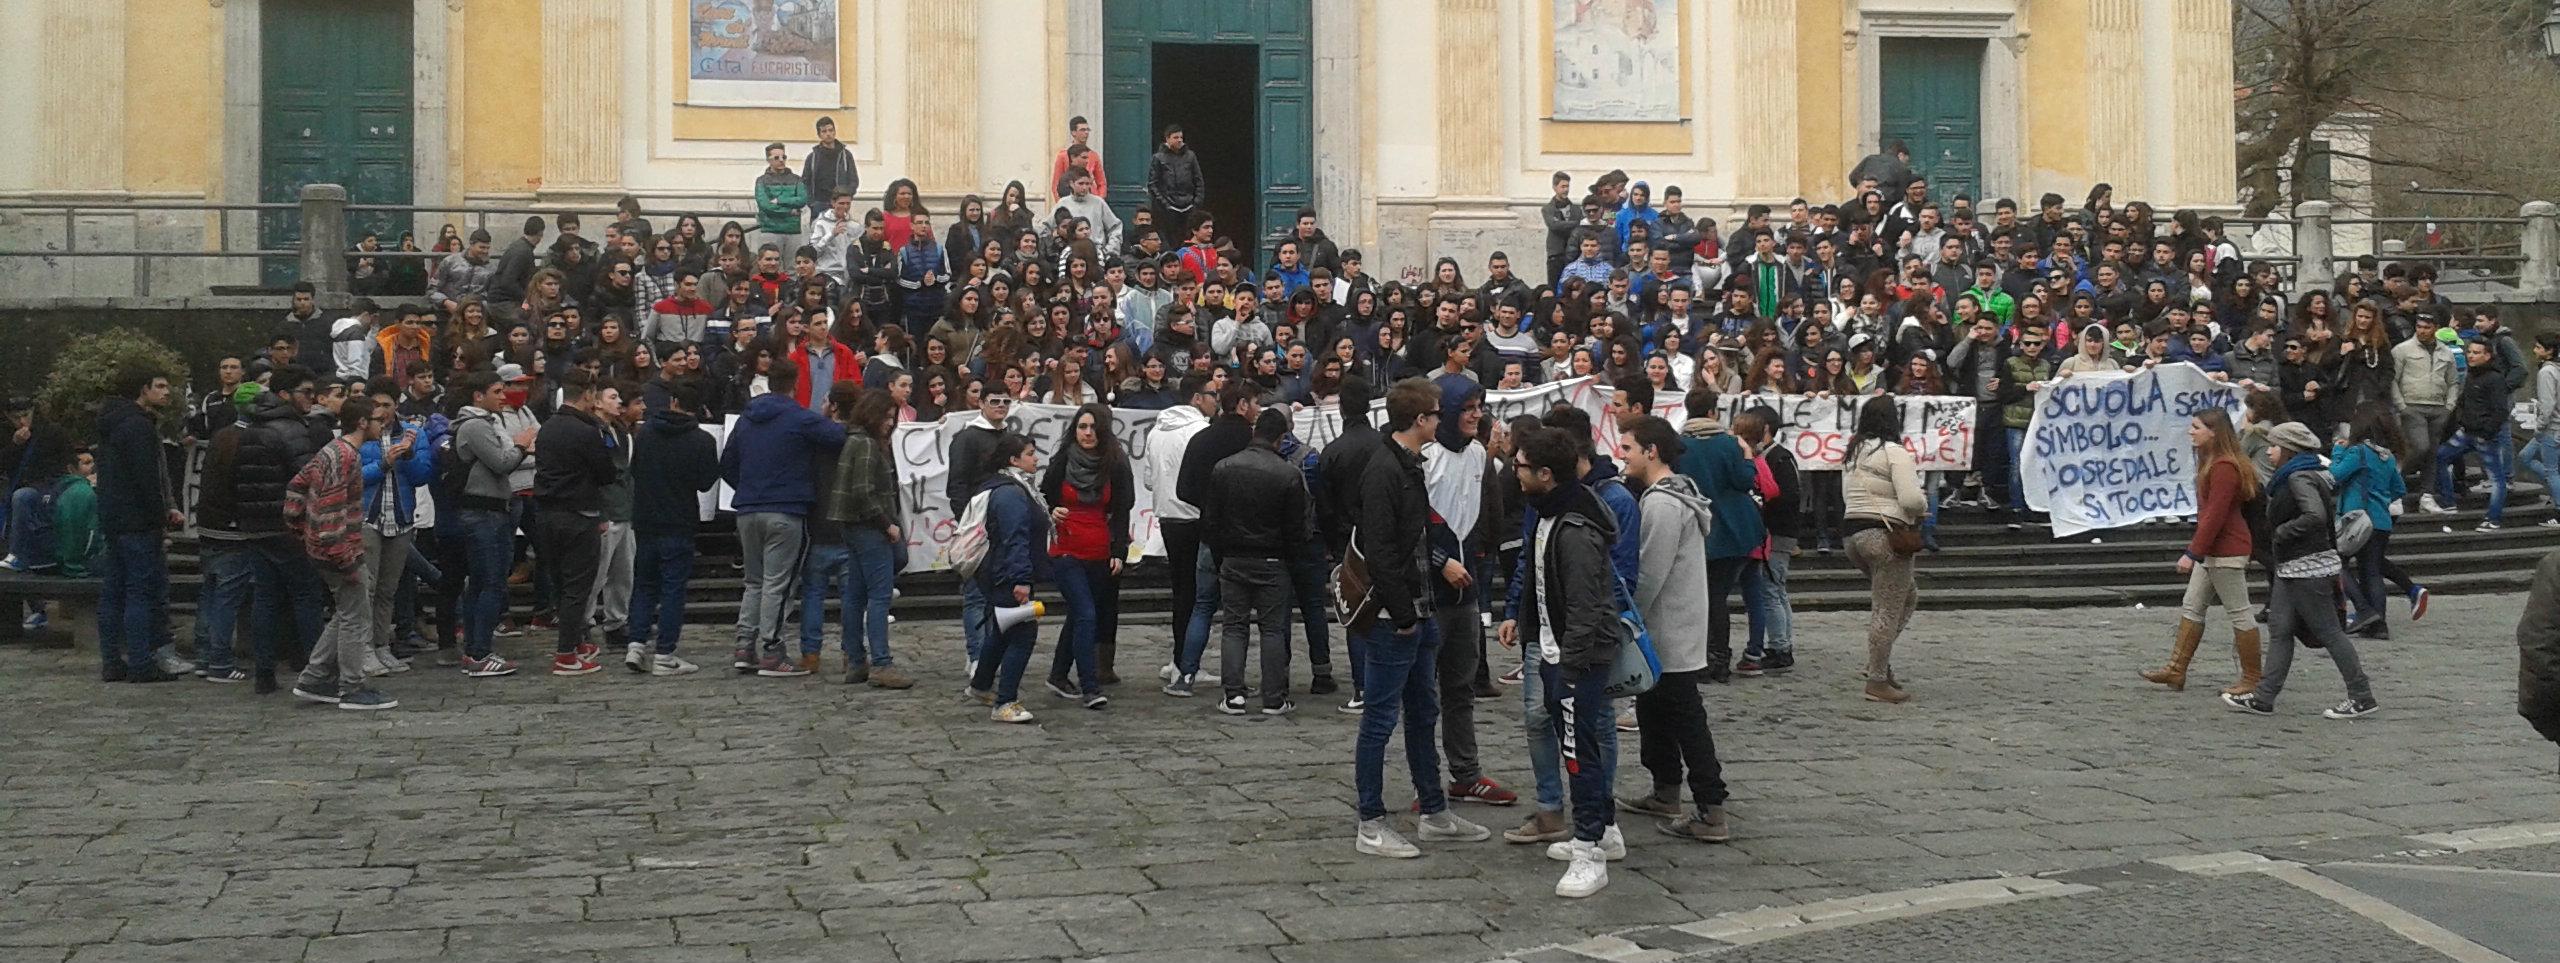 Manifestazione studentesca per l'ospedale